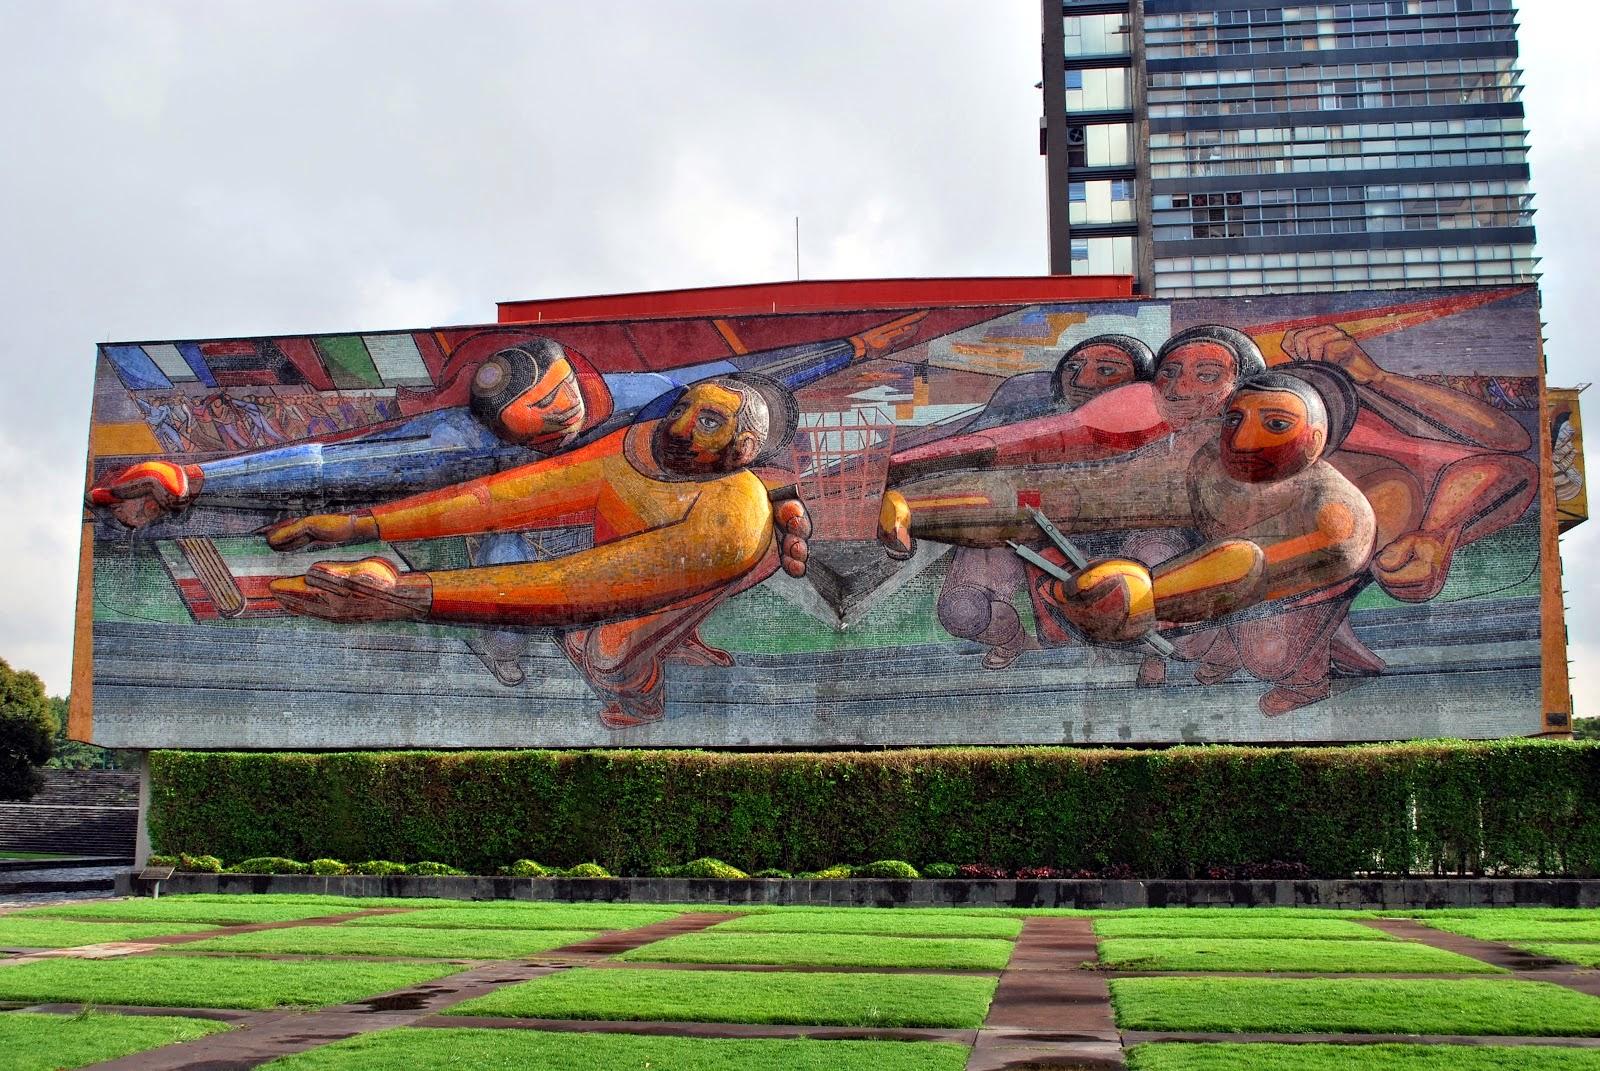 La espina roja agosto 2014 for El mural de siqueiros